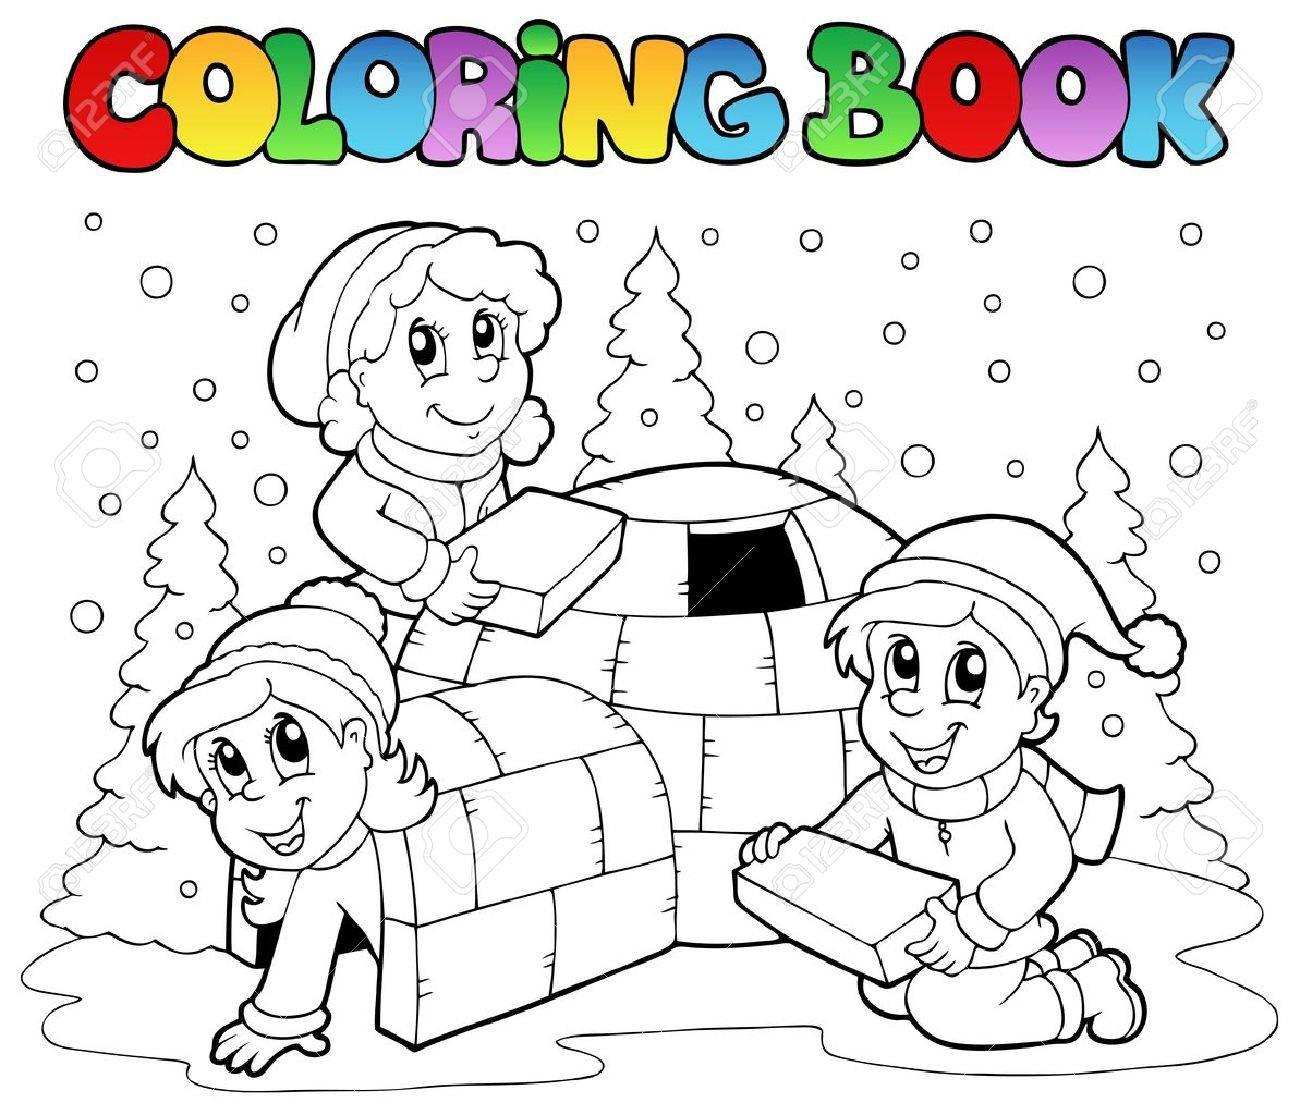 Coloring book winter scene 1 - vector illustration. Stock Vector - 11124966